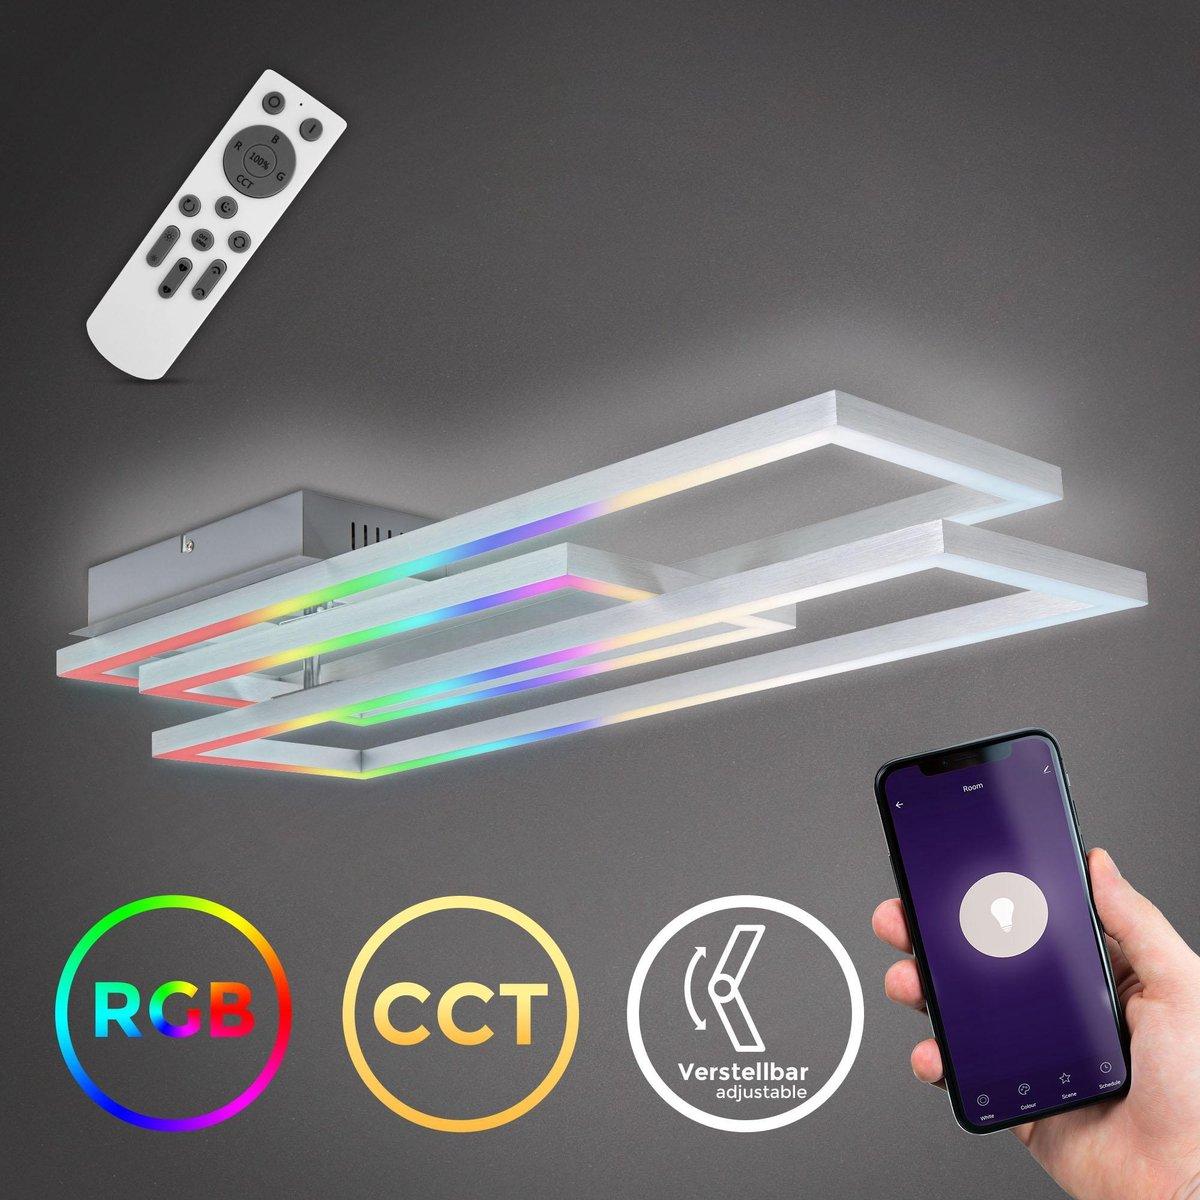 B.K.Licht - LED Frame lamp - Plafondlamp smart - WiFi - Plafonnière - CCT 3000-6500 Kelvin - RGB - app en afstandsbediening - Chroom-Aluminium - dimbaar - 4800 lumen - 48 Watt